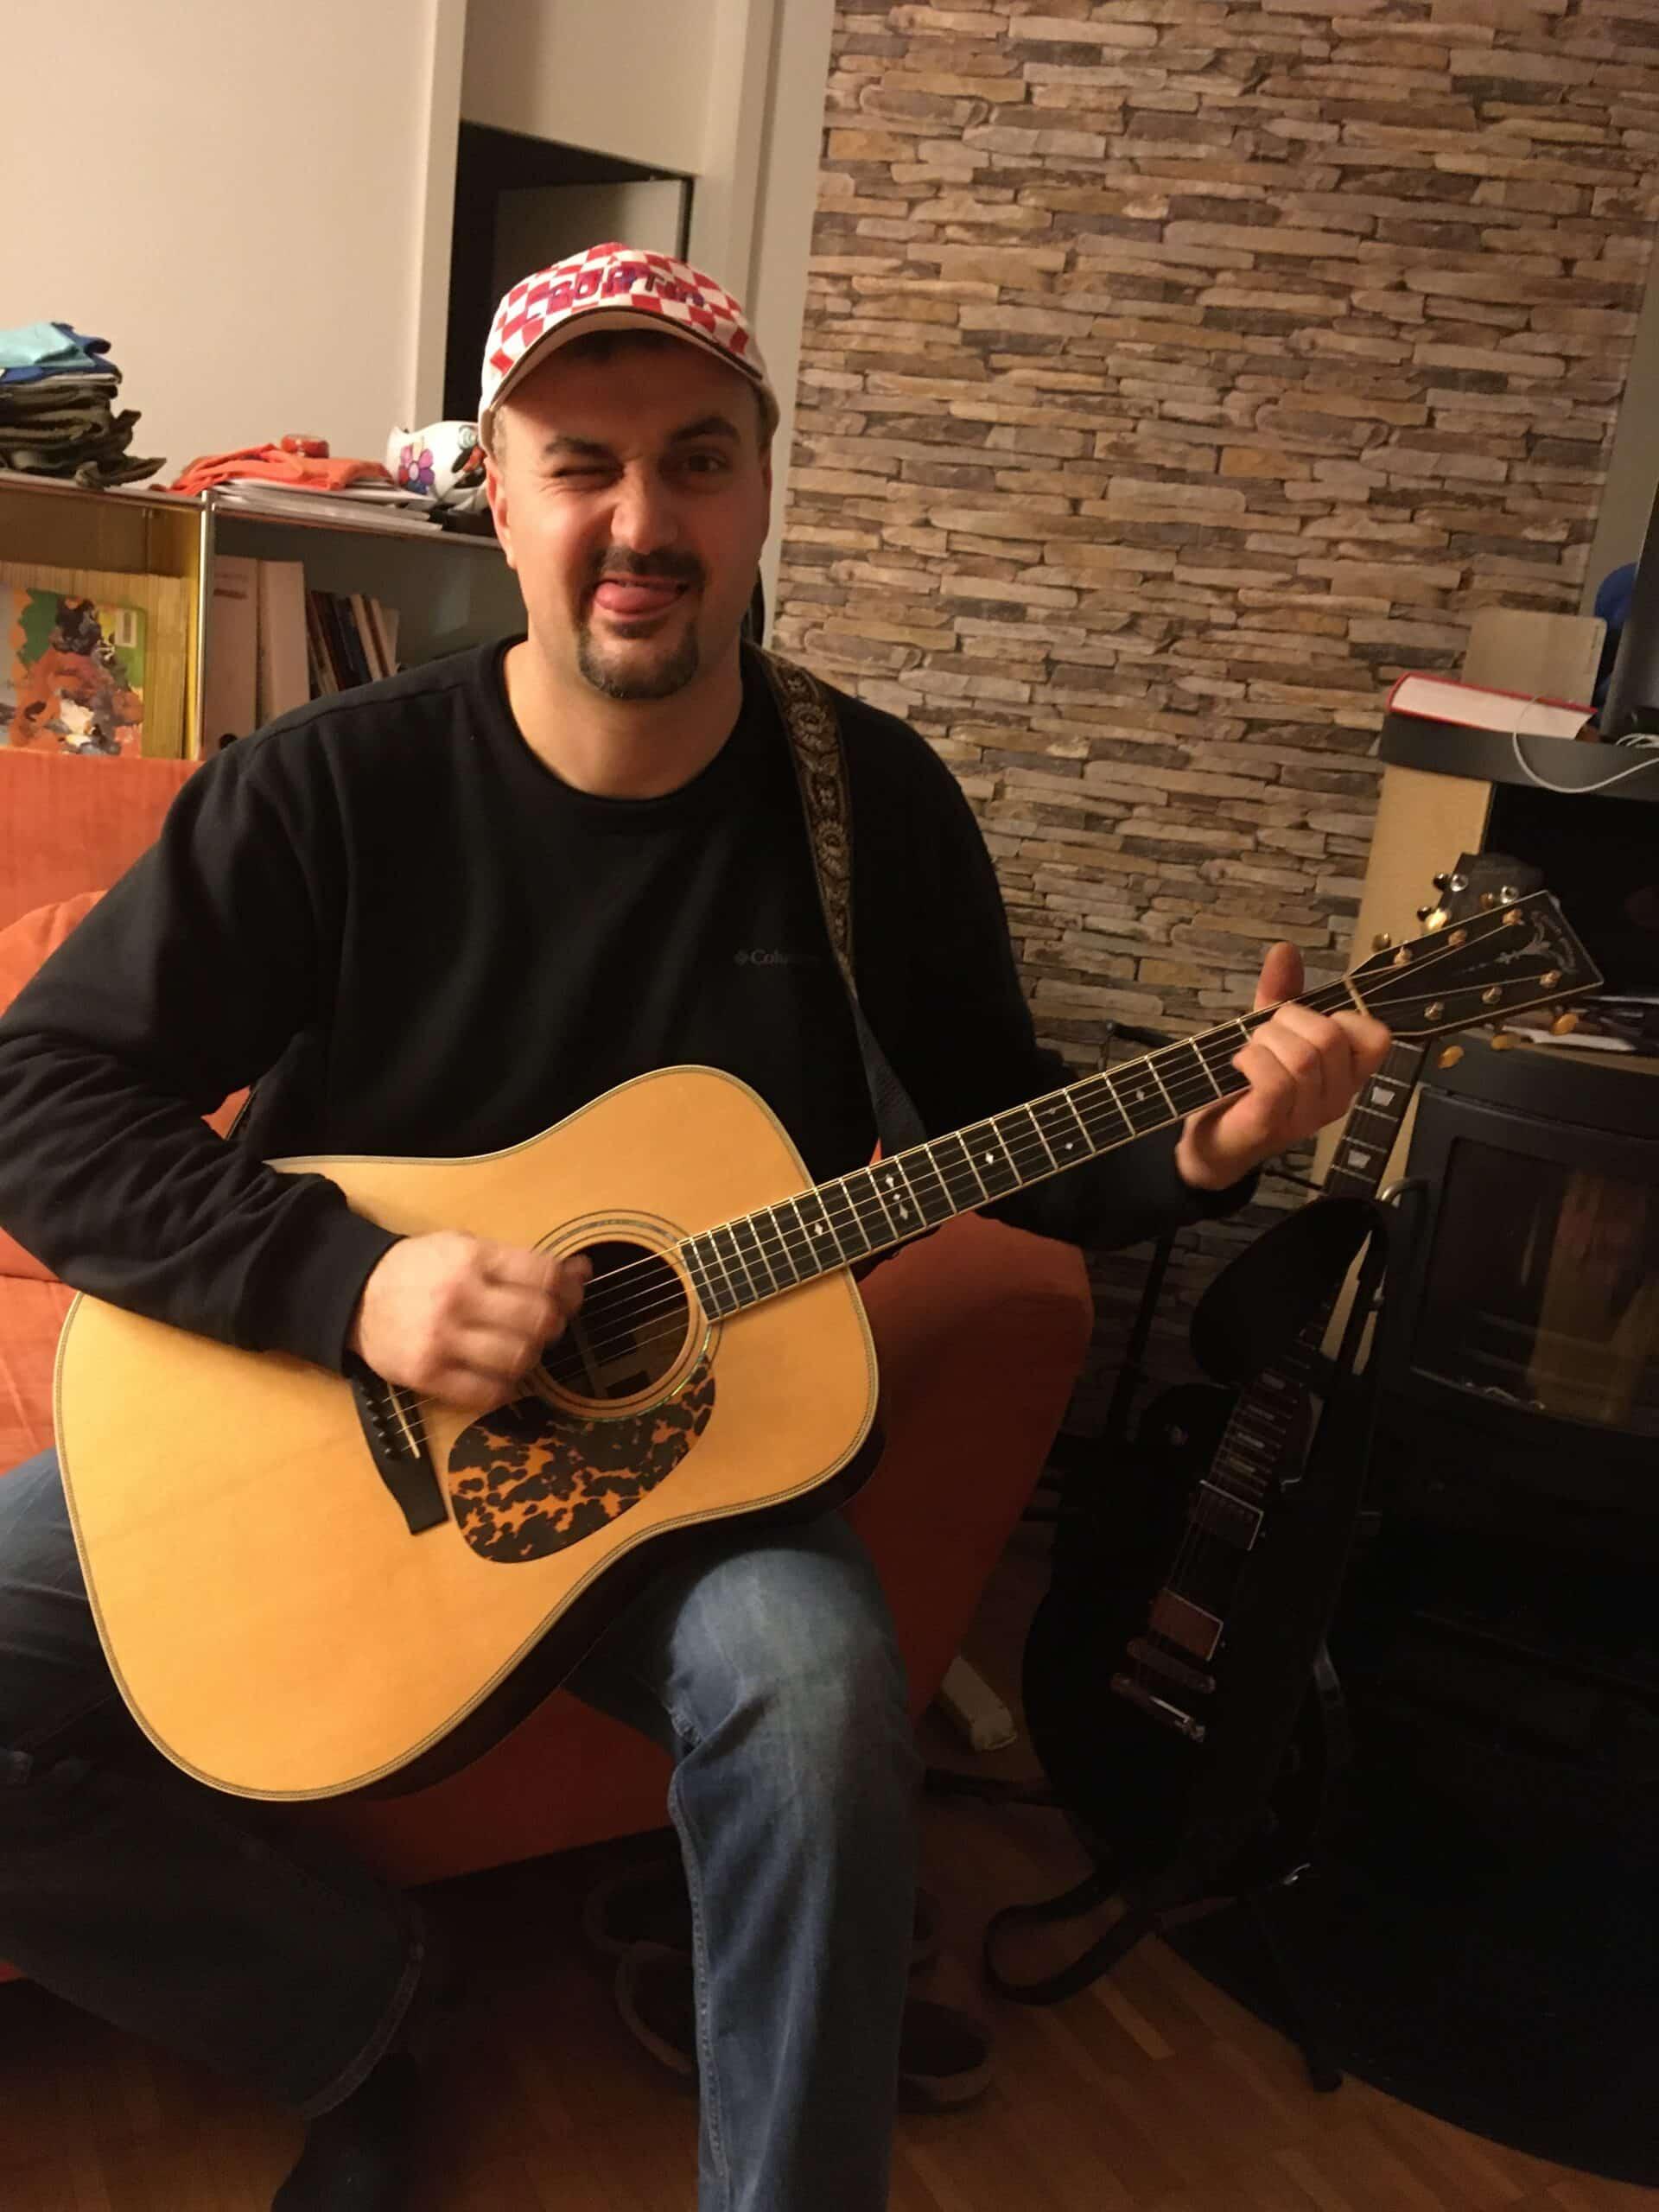 Gitarre lernen online mit Gitarrenkursen